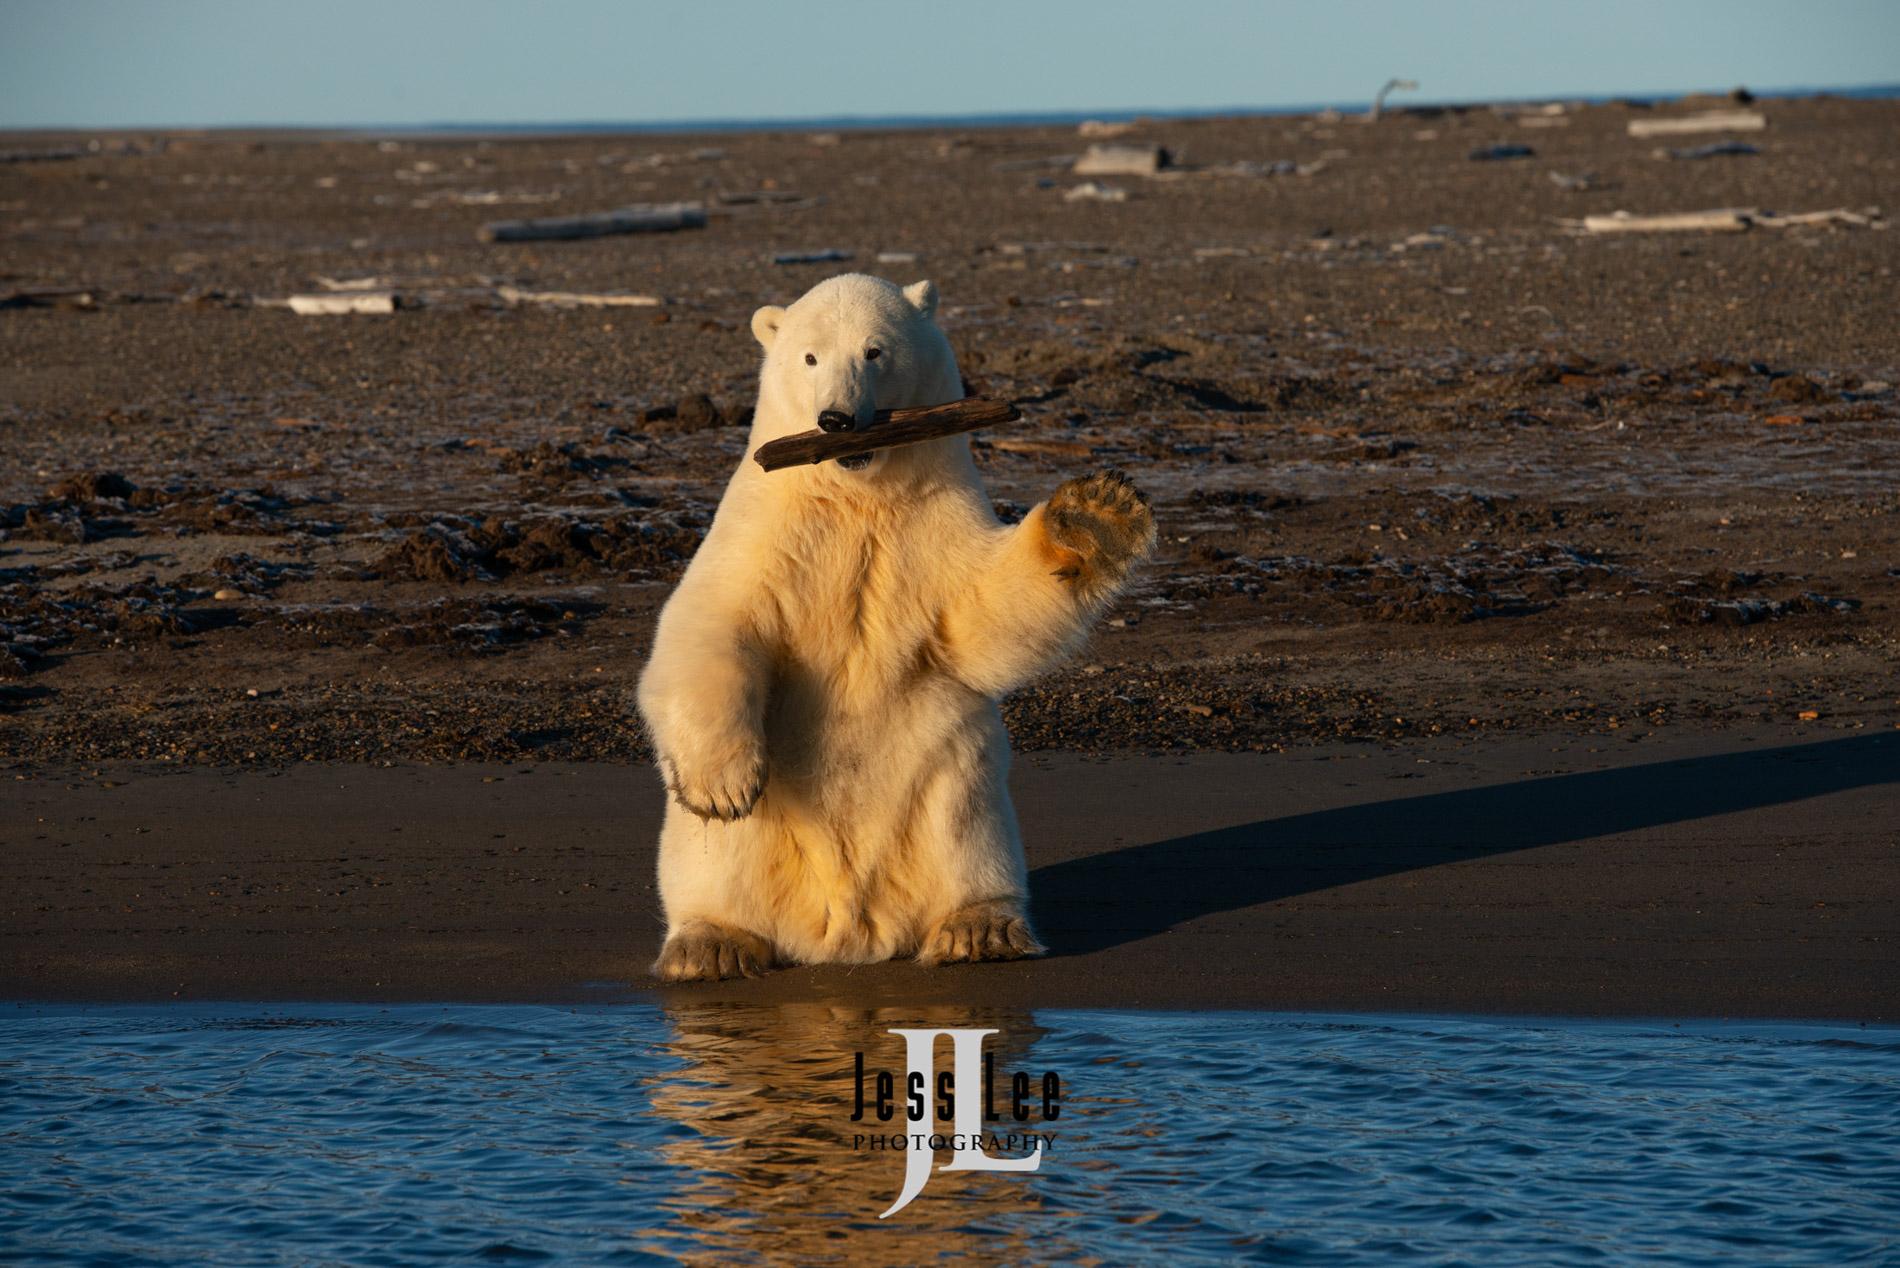 arctic, arctic National wildlife refuge, bear, bears, churchill, mammal, Alaska, marine, polar, polar bear, polar bears, ANWR,, photo